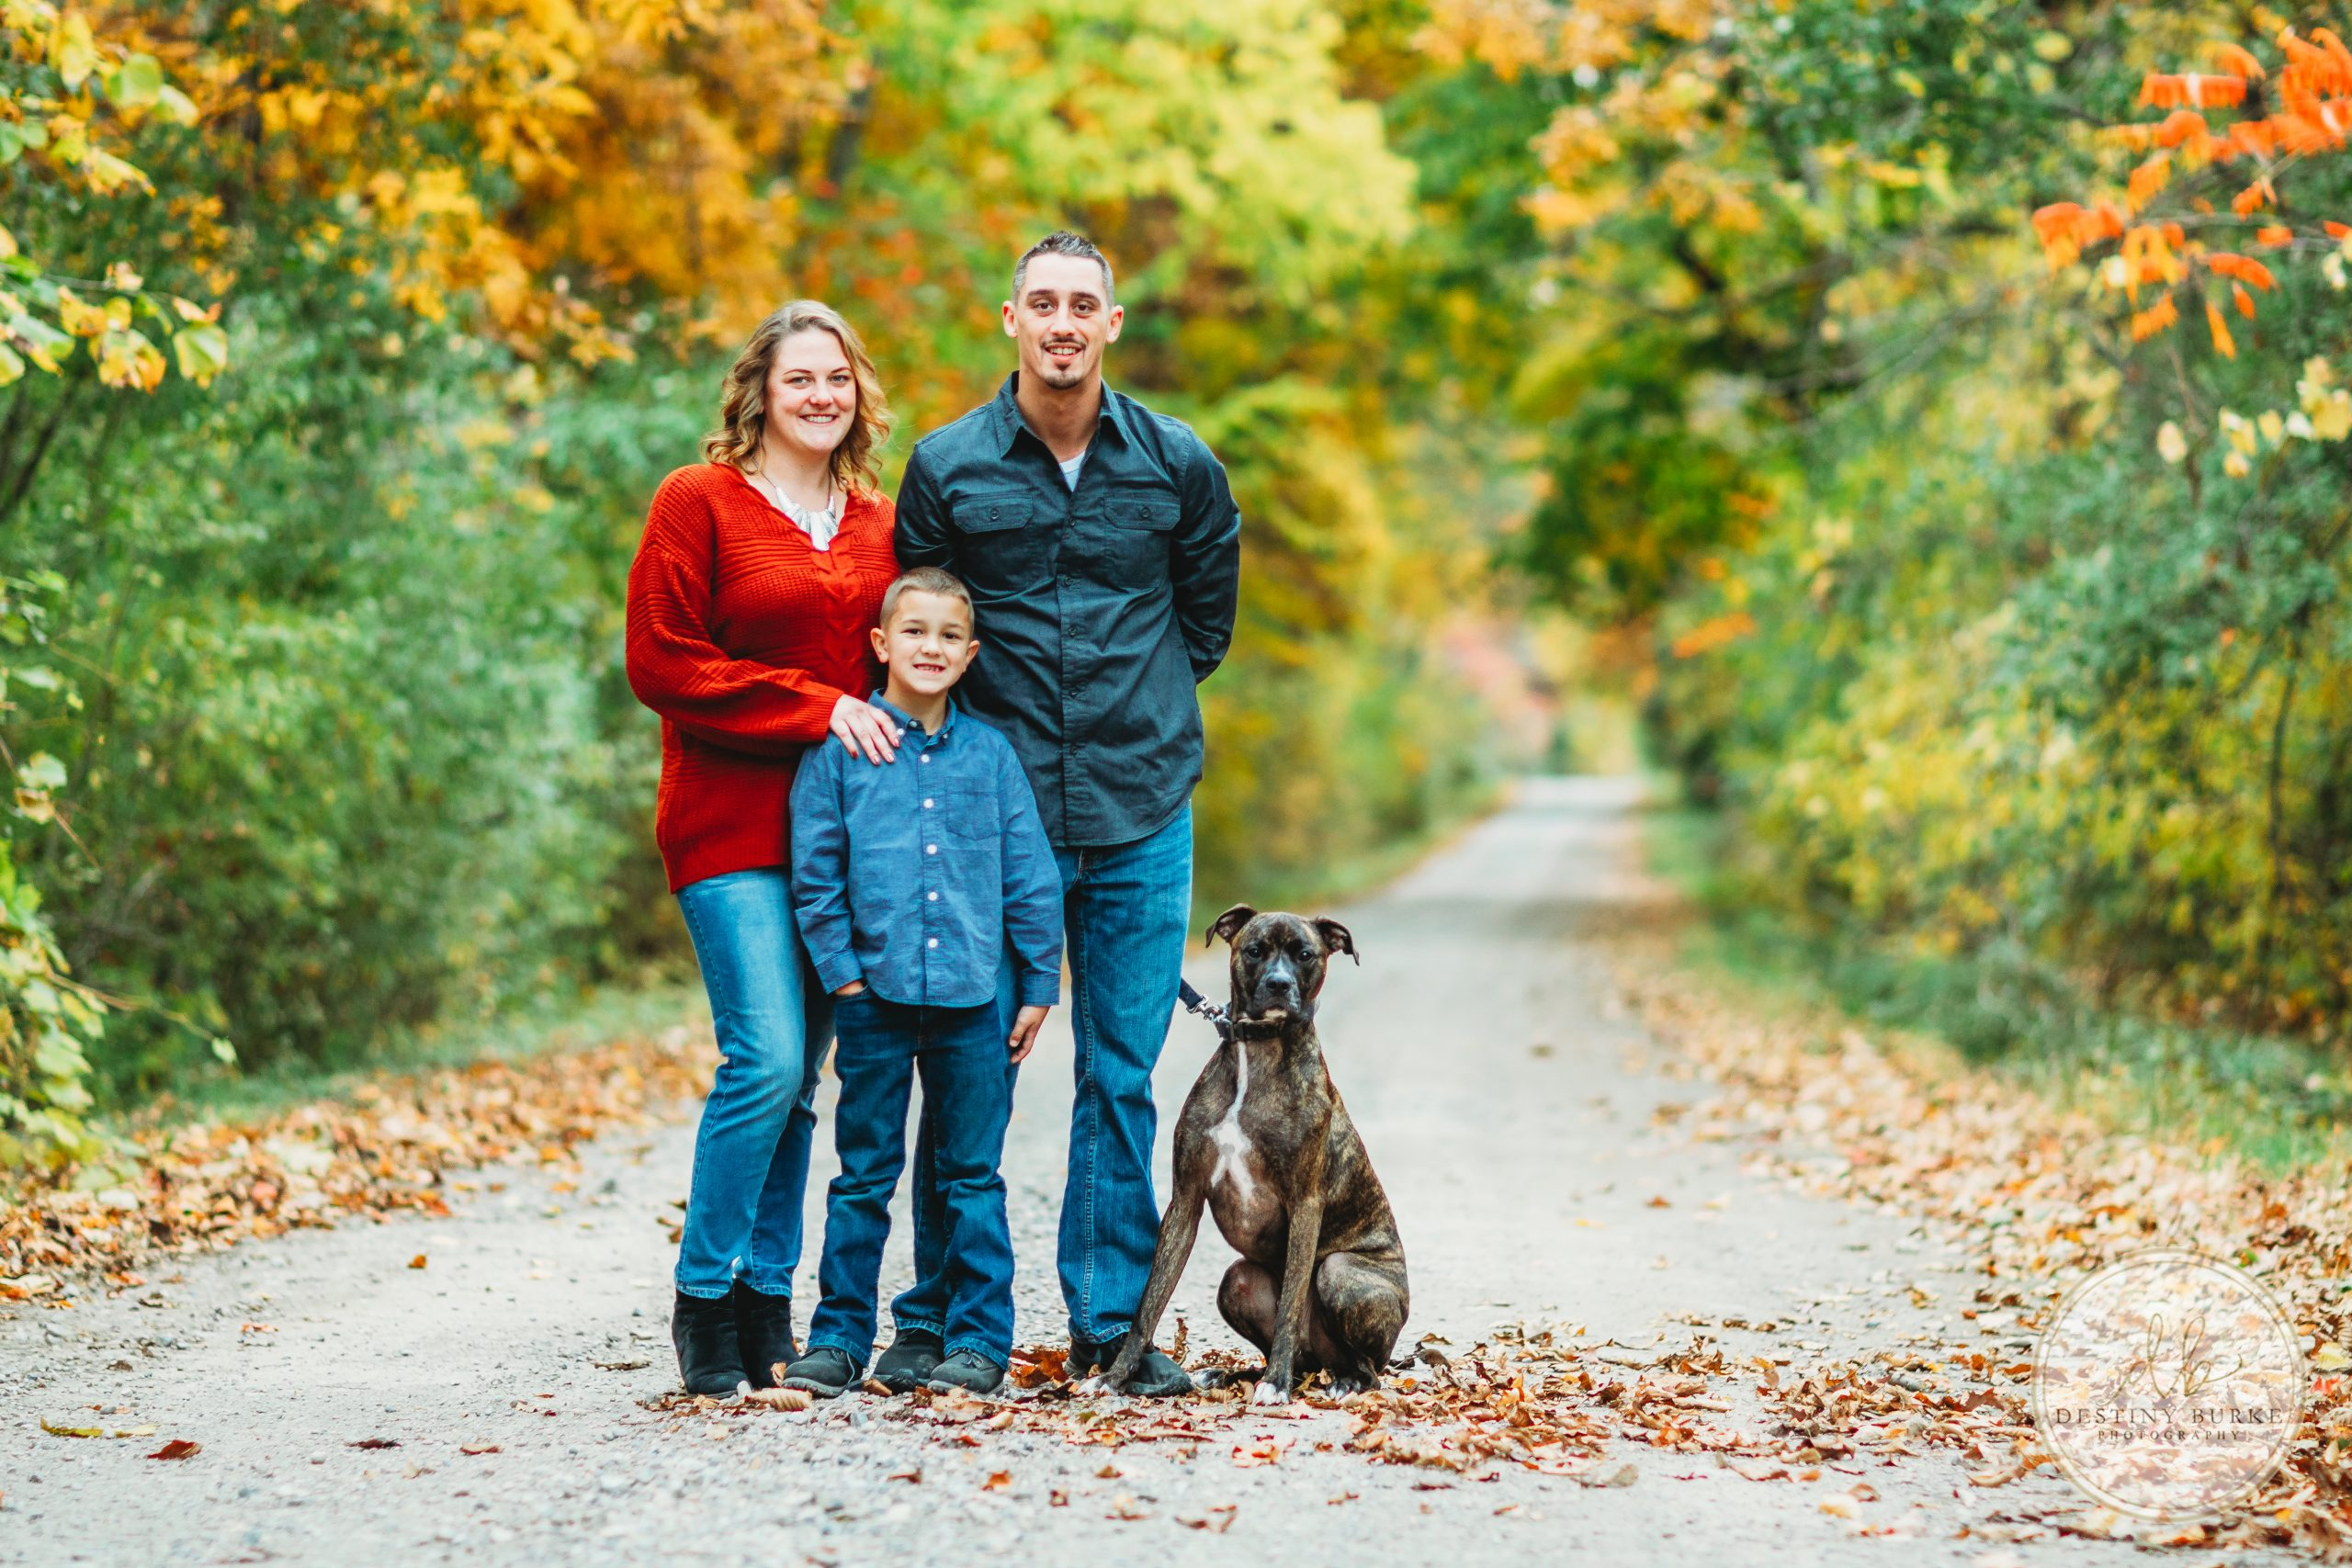 Family, Pet, Dog, Autumn, Fall, Leaves, Boxer, 3, Path, Road